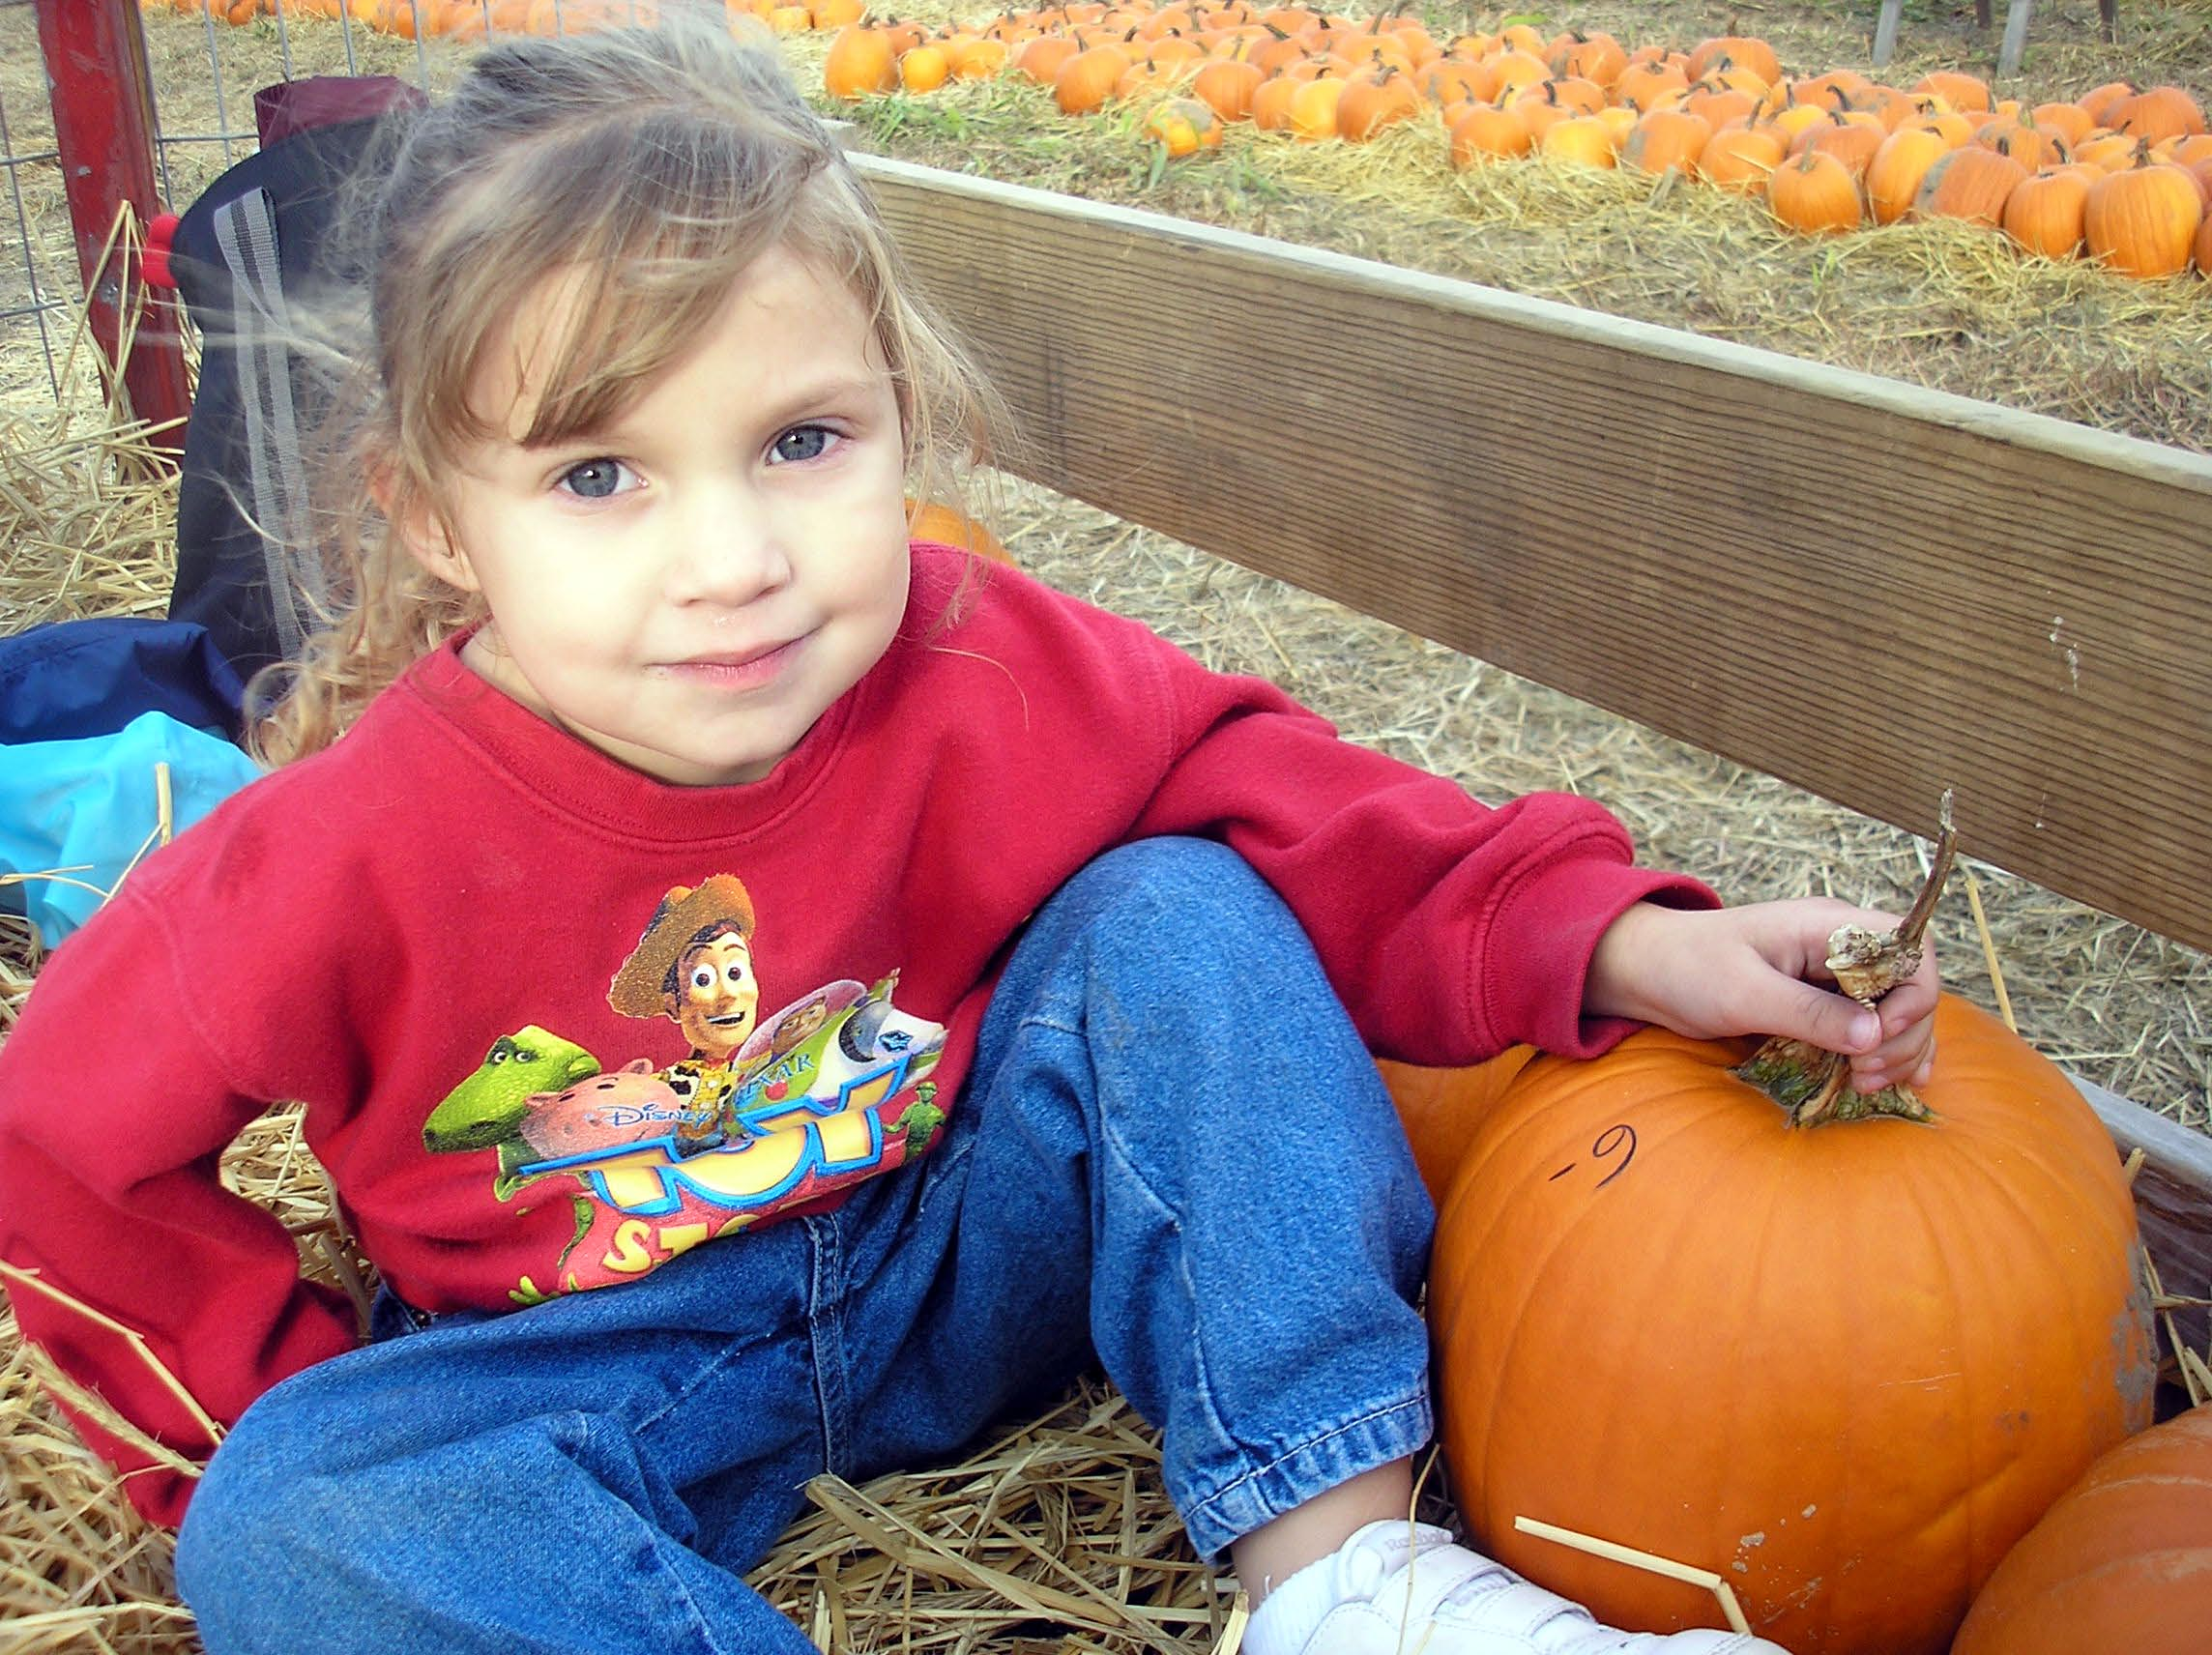 This one's mine!, Bspo06, Children, Fall, Farms, HQ Photo